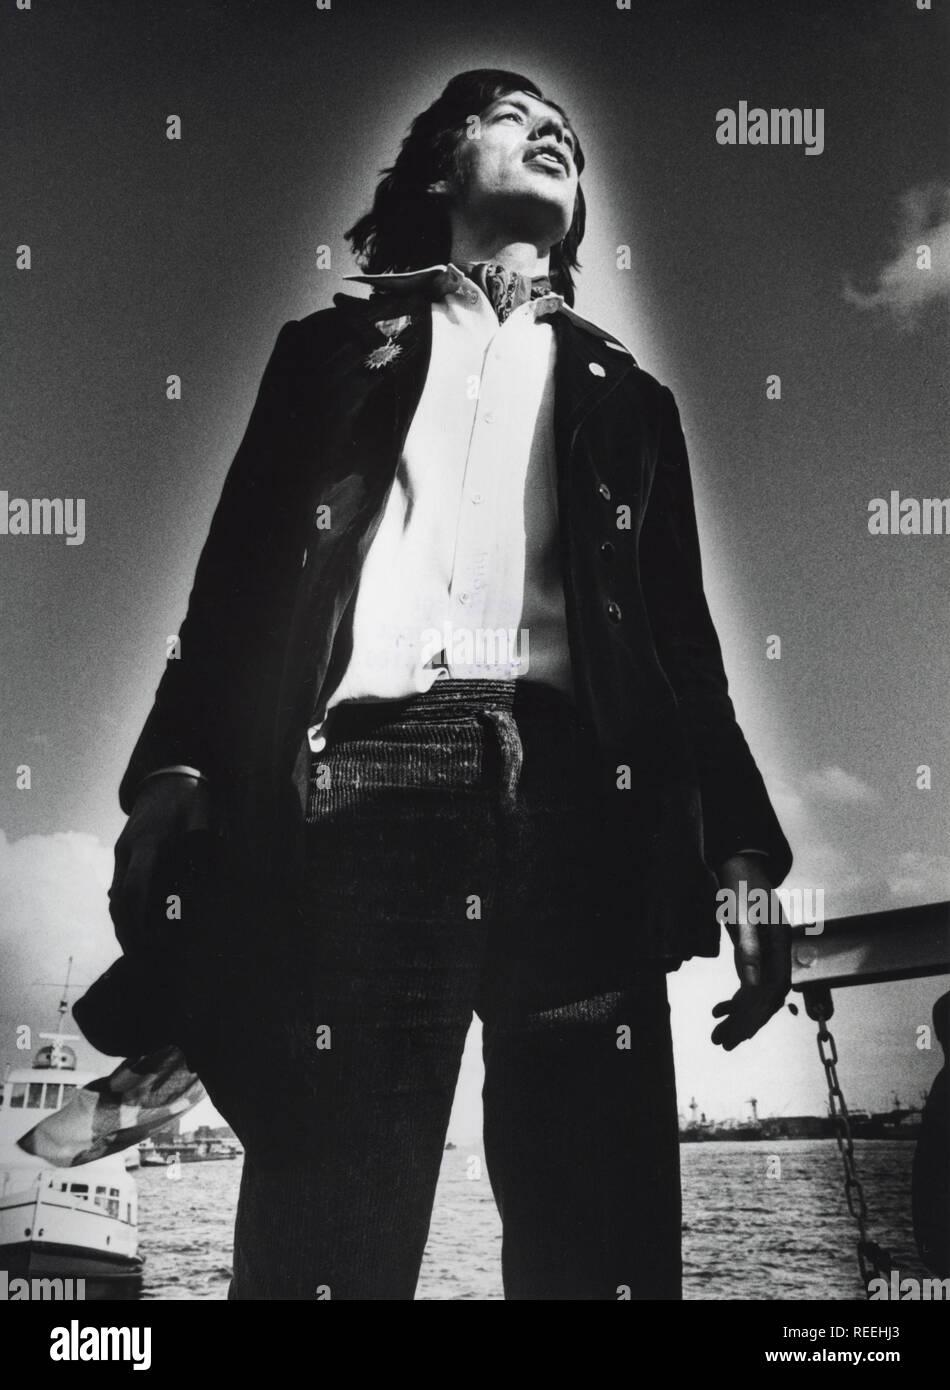 HAMBURG, GERMANY - SEPTEMBER 13: Mick Jagger from The Rolling Stones posed in Hamburg, Germany on September 13 1970 (Photo by Gijsbert Hanekroot) - Stock Image